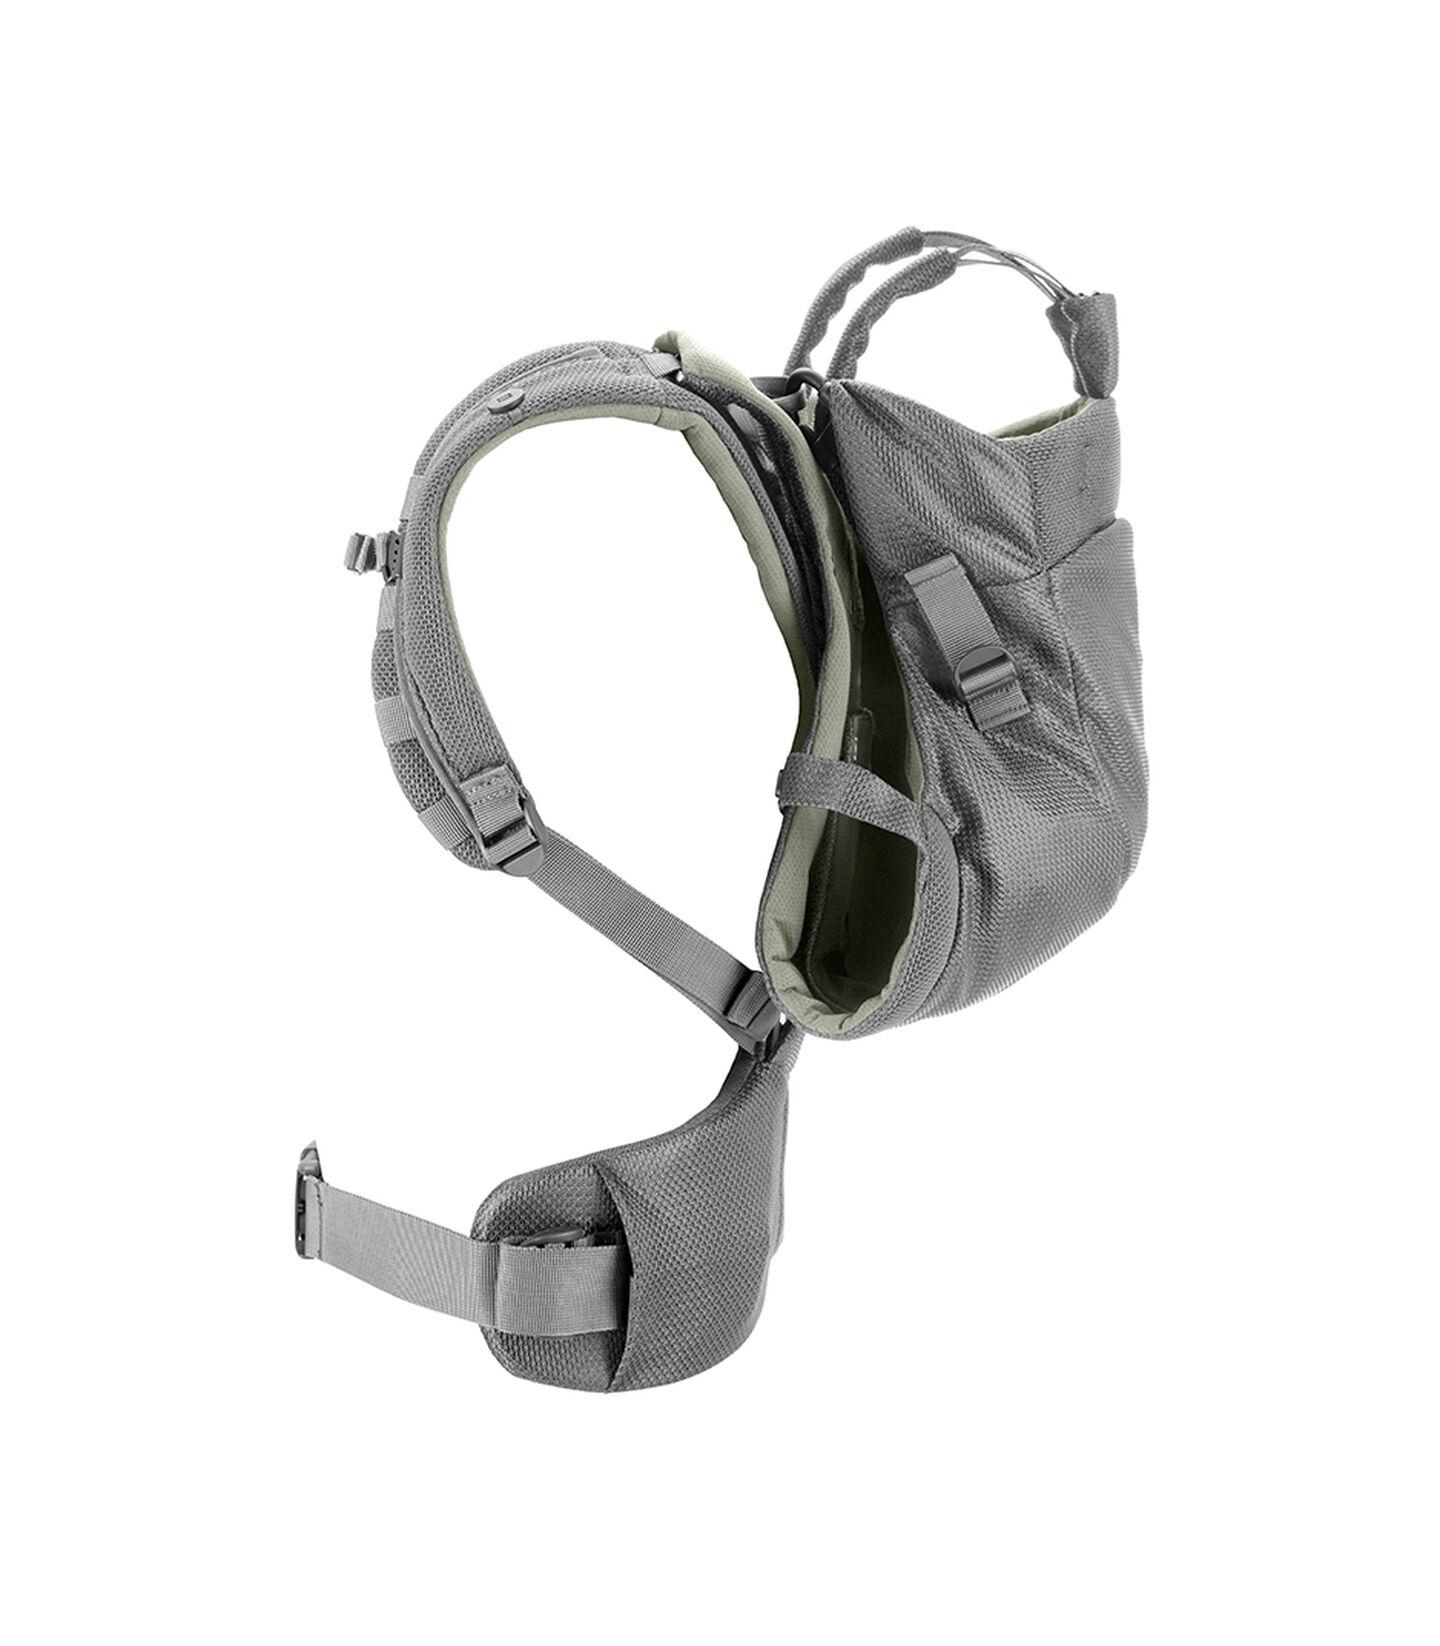 Stokke® MyCarrier™ Back Carrier Green Mesh. Profile.